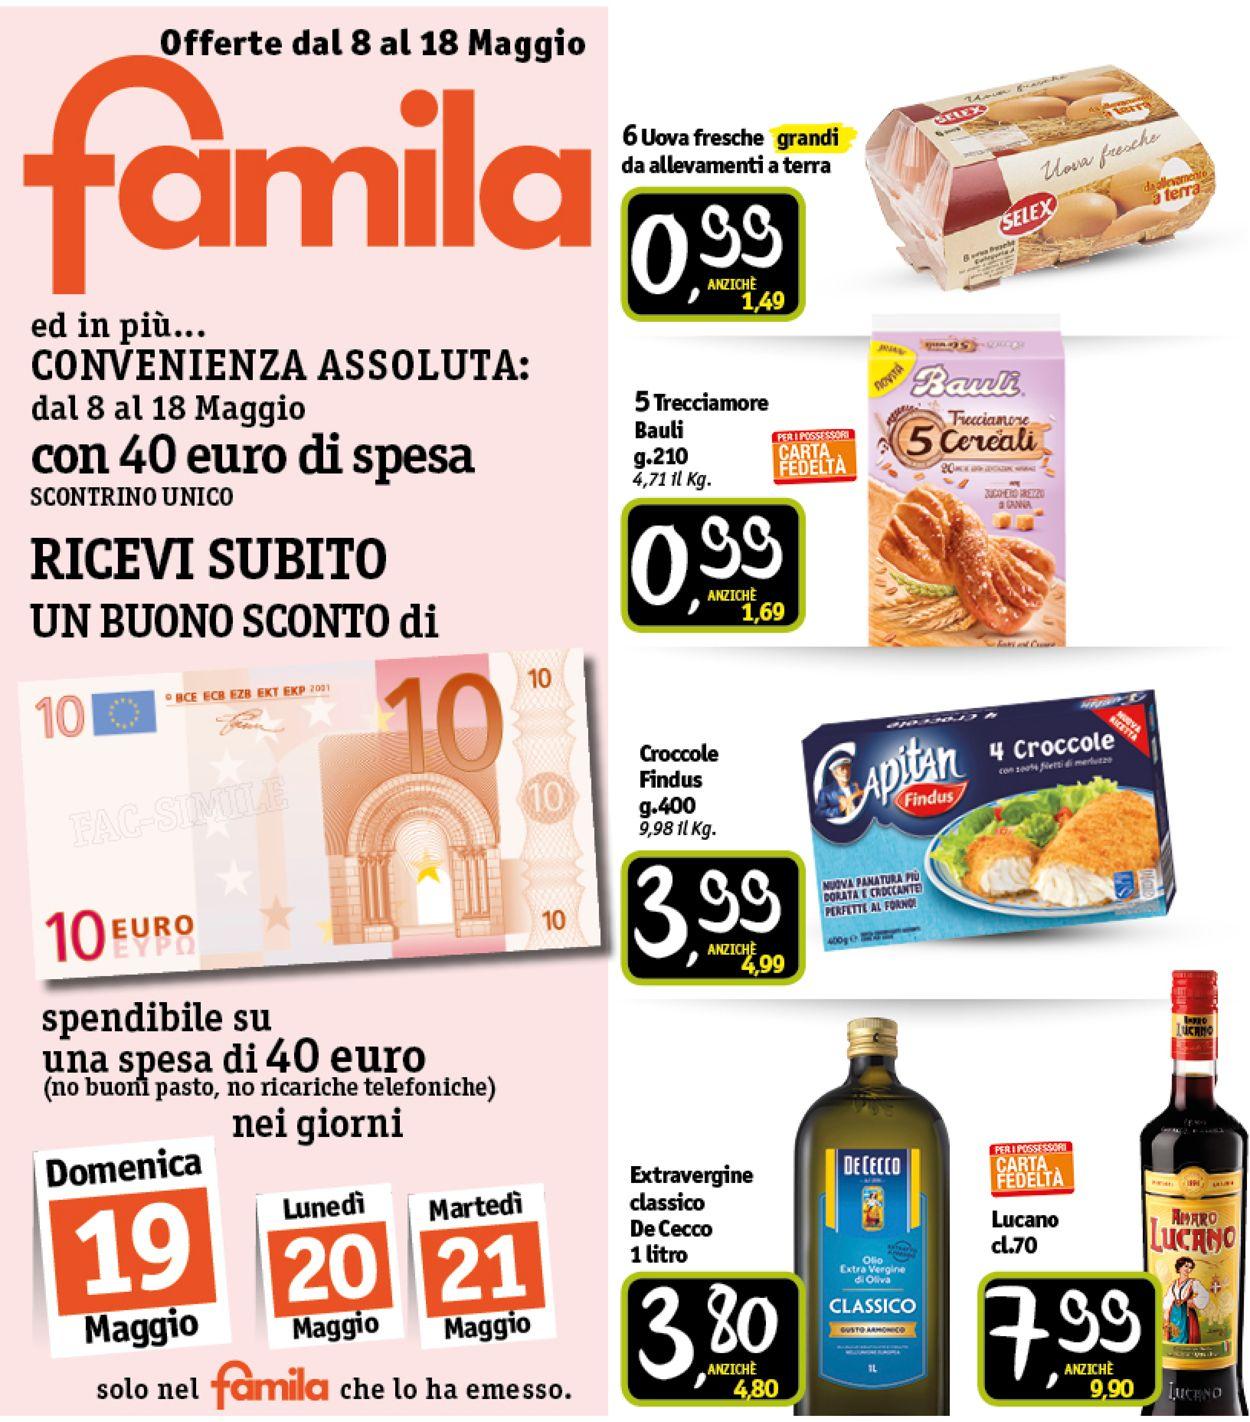 Volantino Famila - Offerte 08/05-18/05/2019